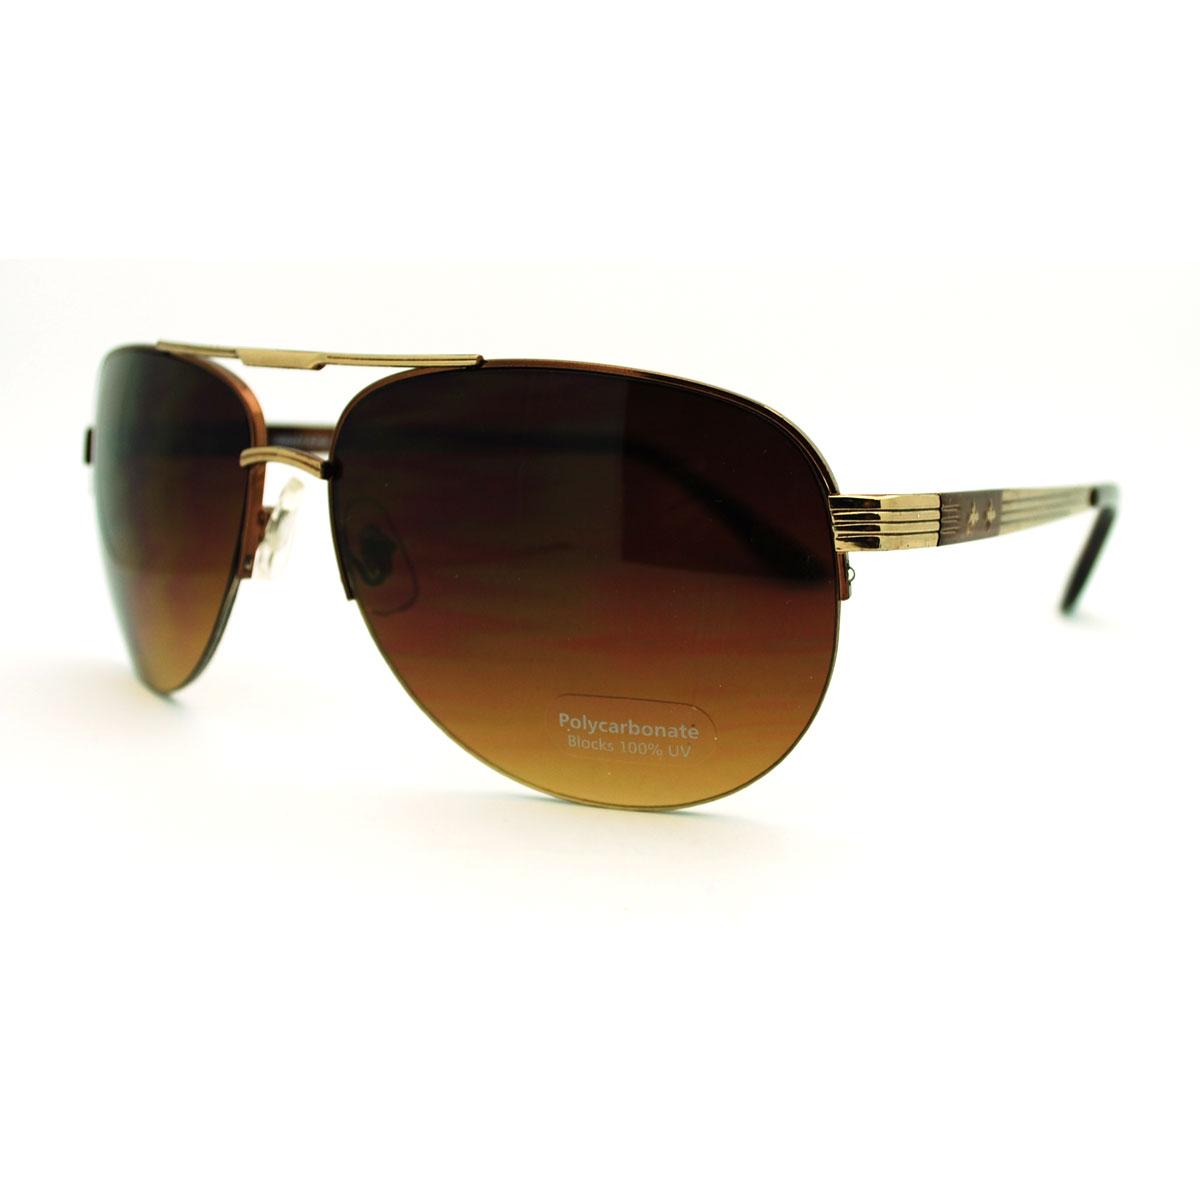 Classic Men's European Fashion Aviator Sunglasses